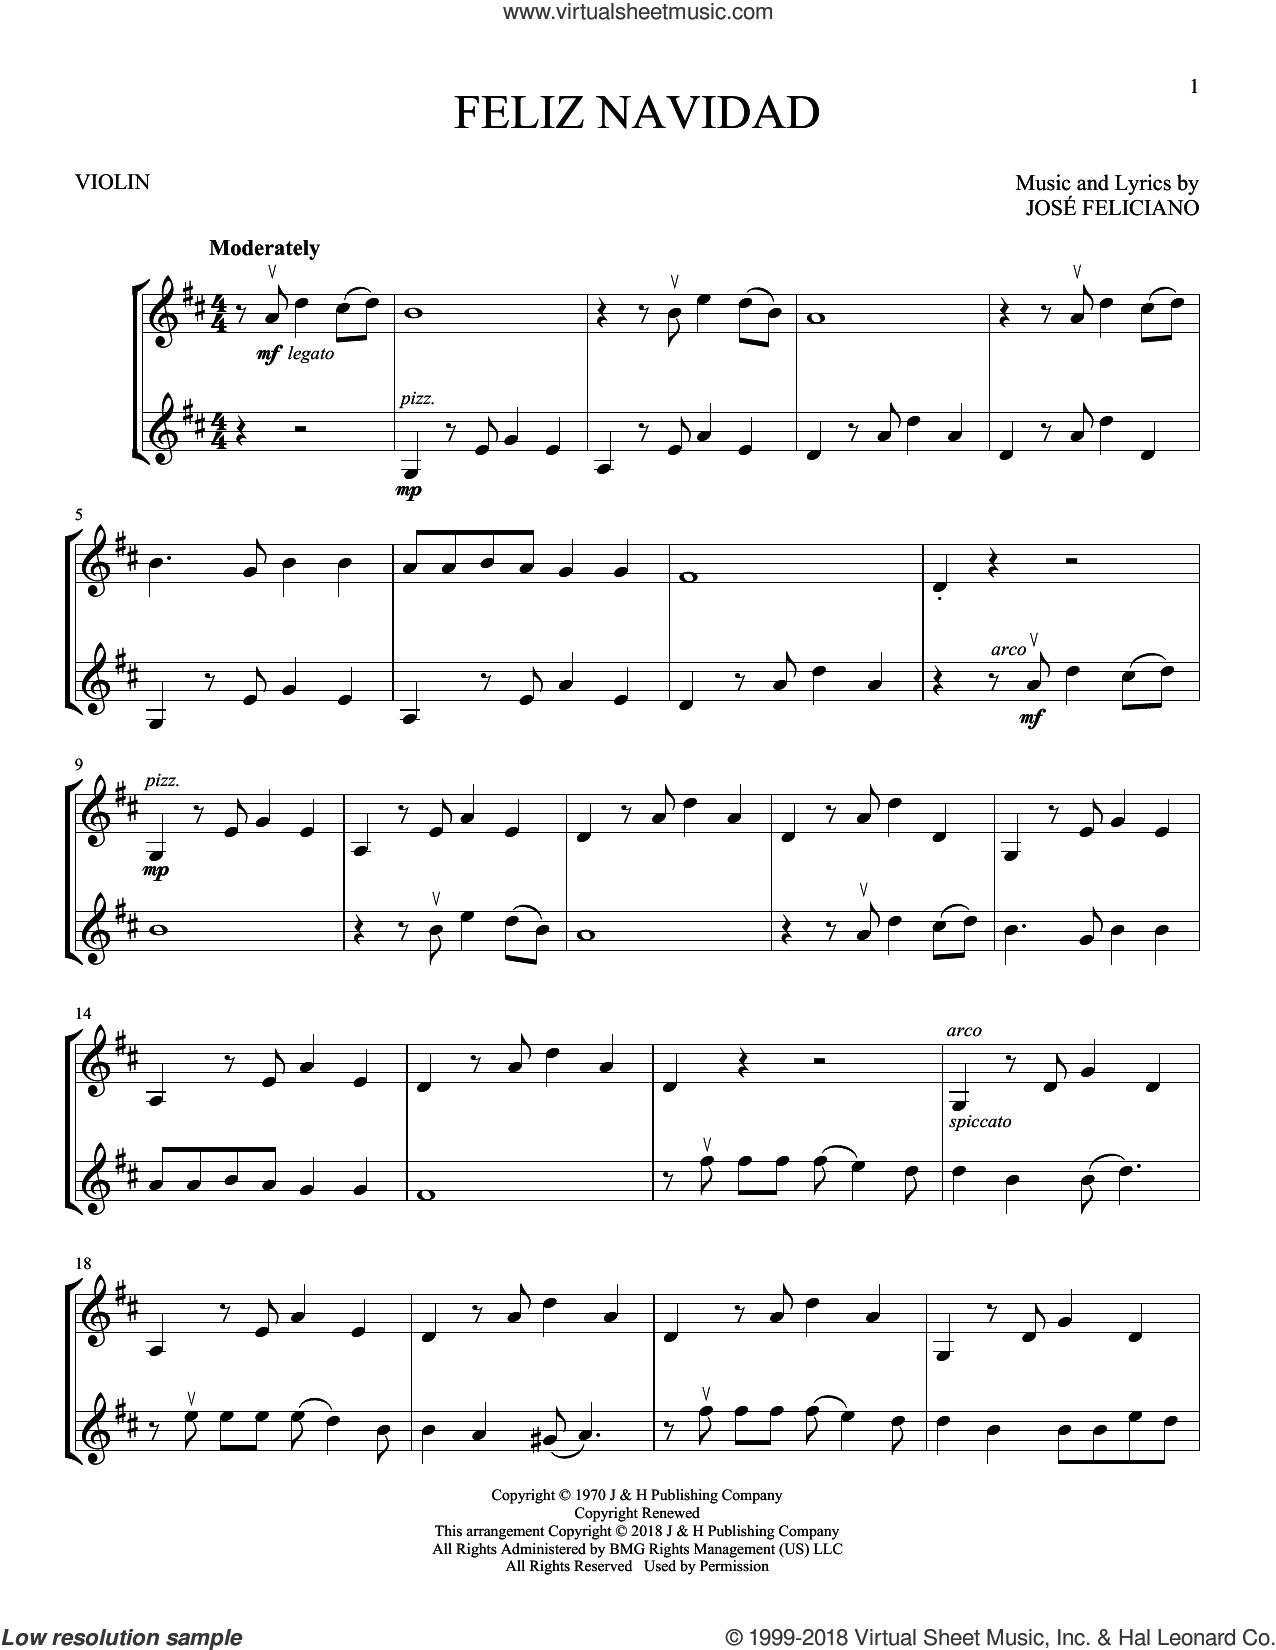 feliciano - feliz navidad sheet music for two violins (duets, violin duets)  | sheet music, violin music, violin  pinterest